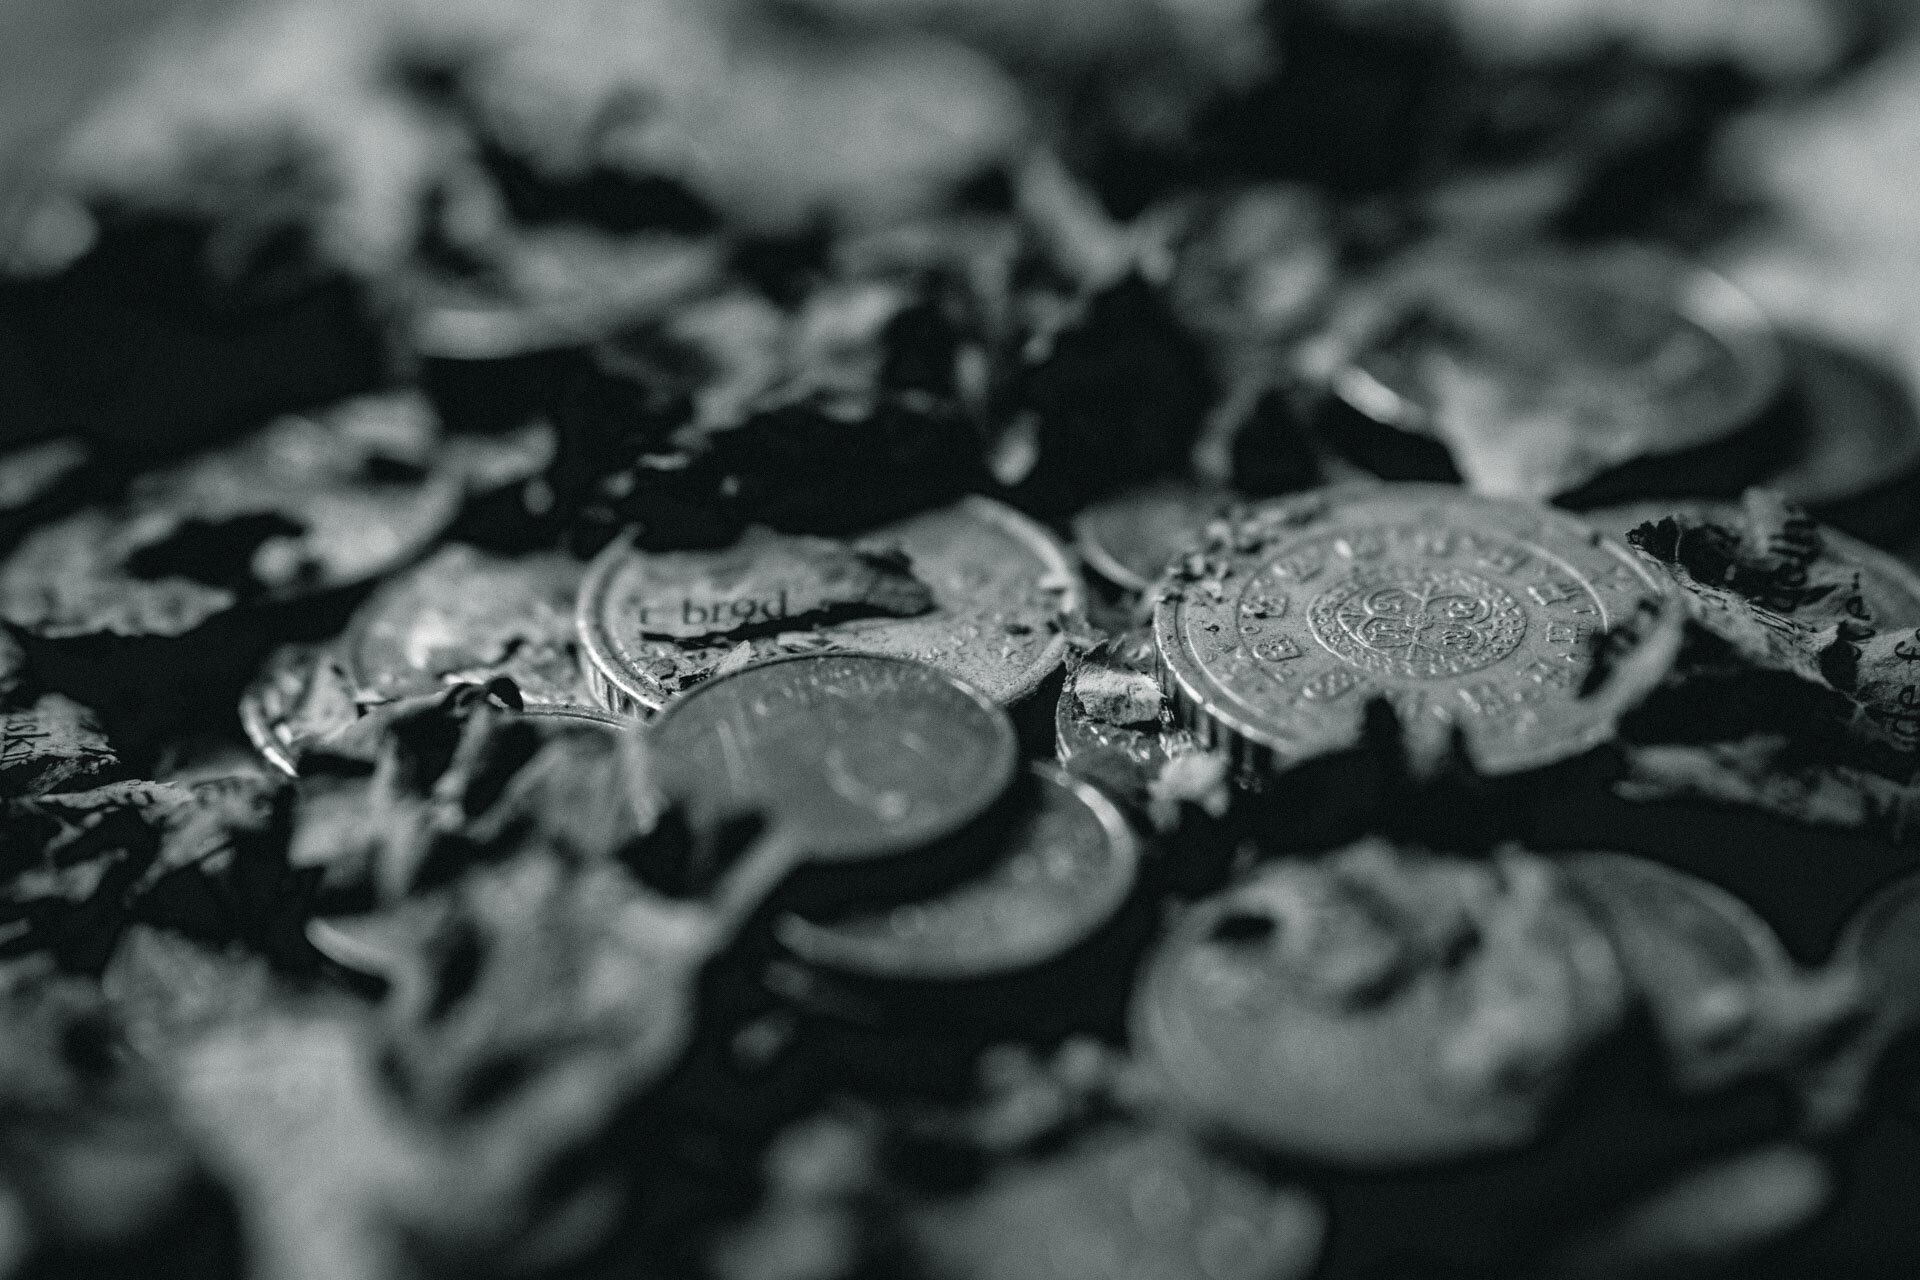 BPP 12 - Coins - IG-9.jpg